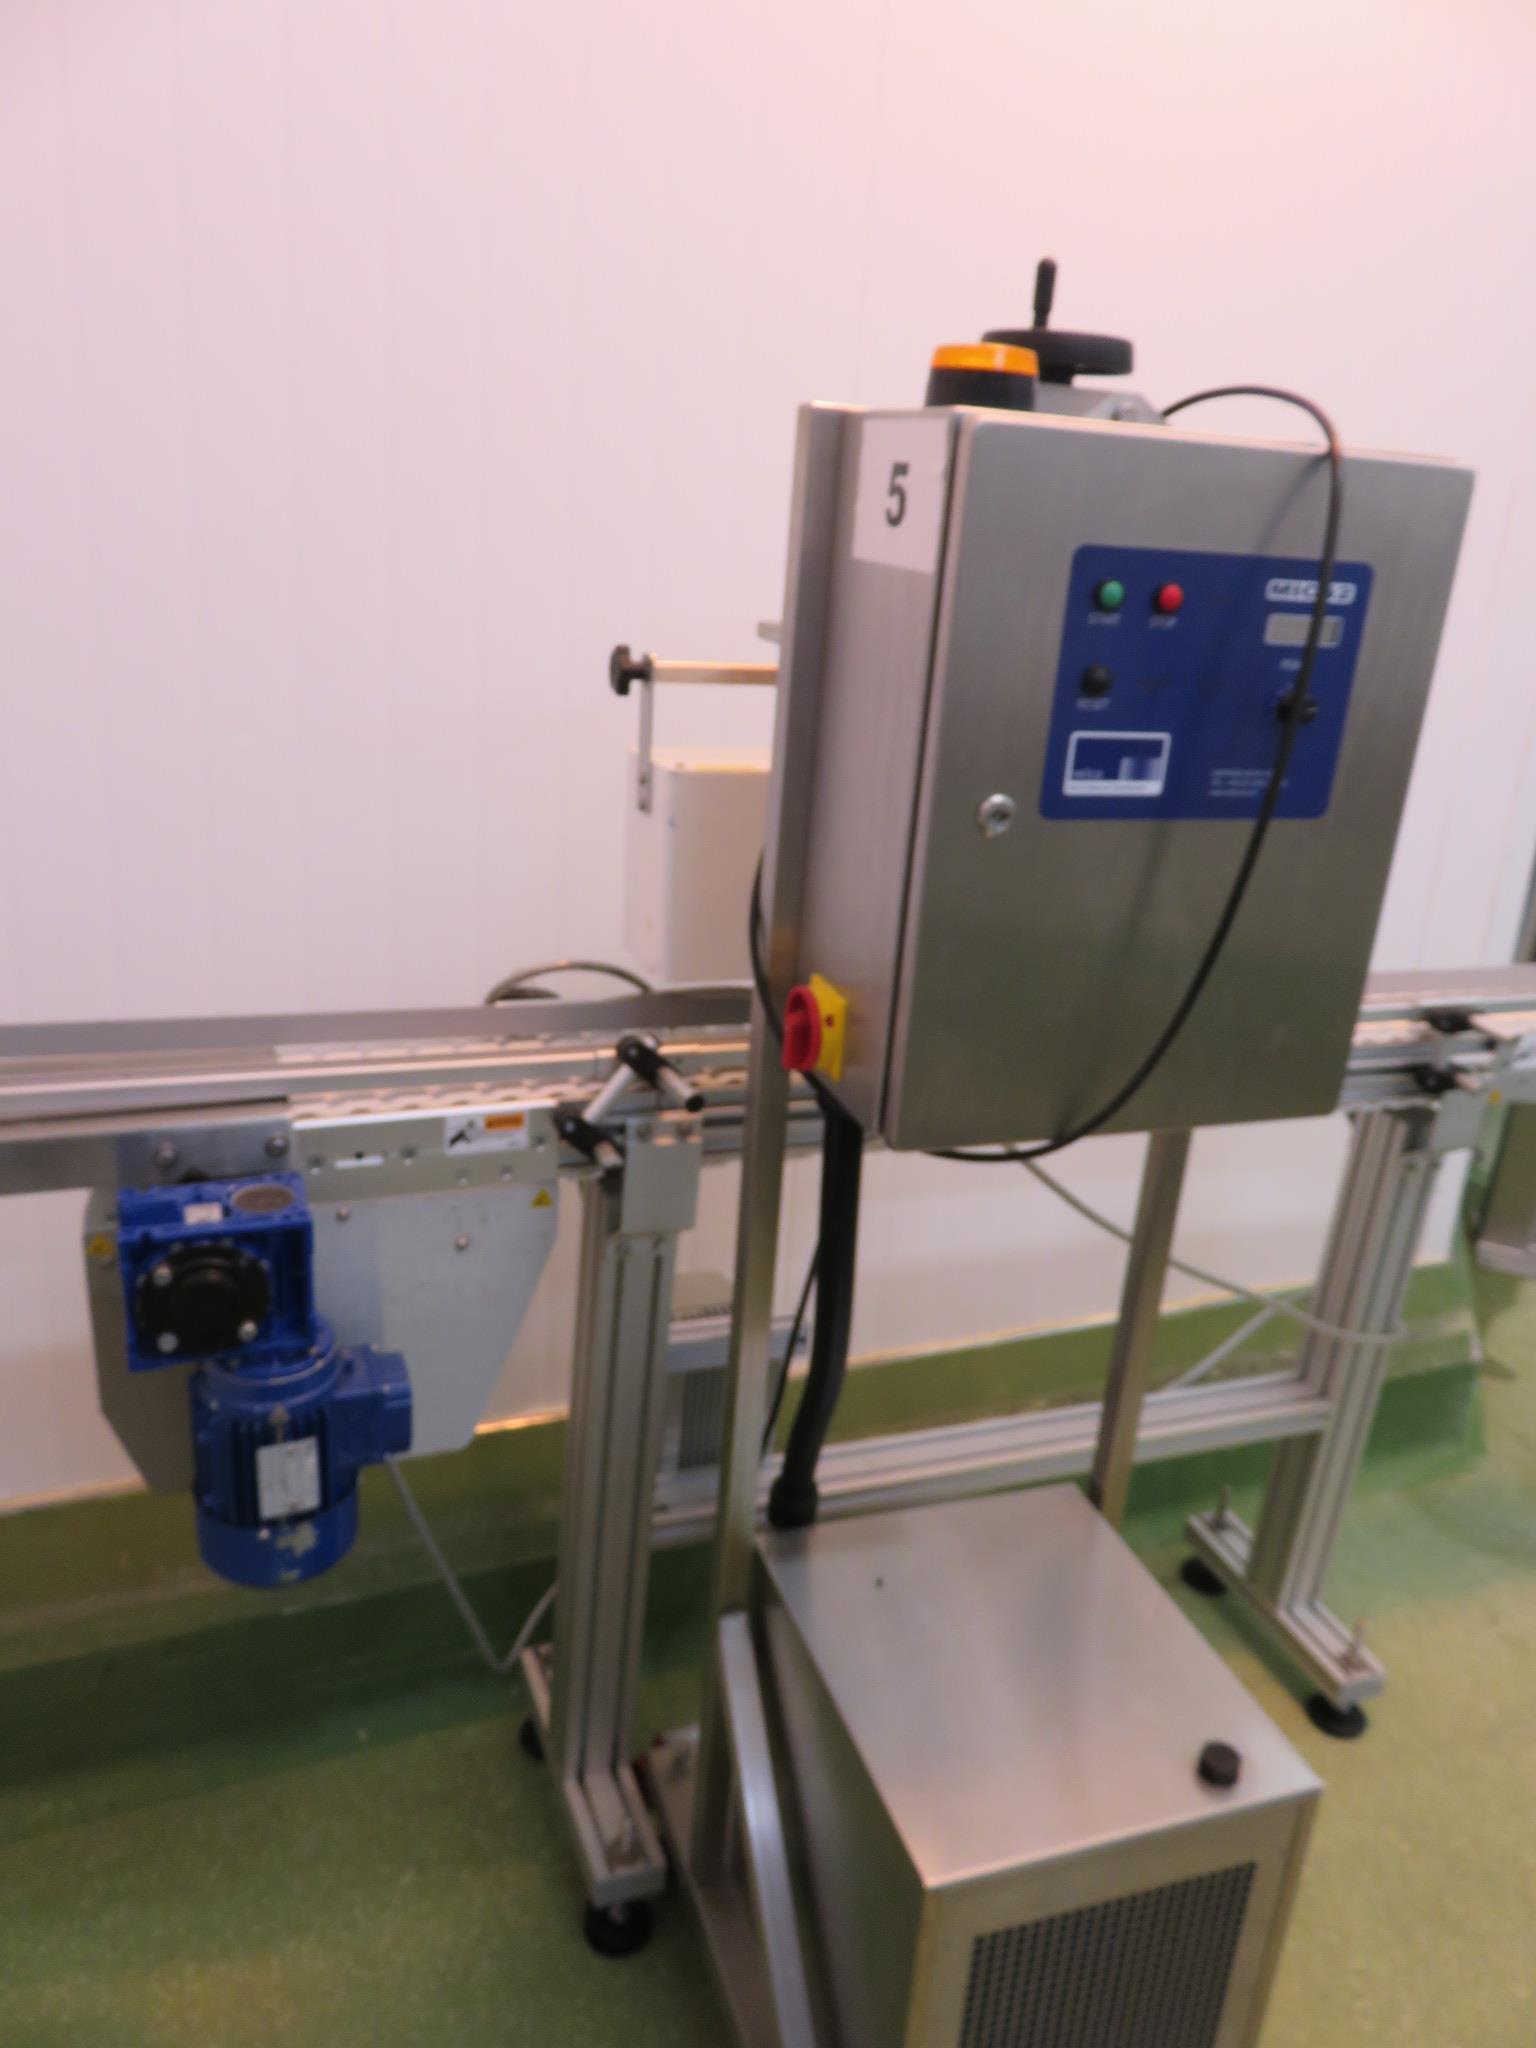 HF Technology induction sealing machine model MICS 2. LO £60. - Image 2 of 5